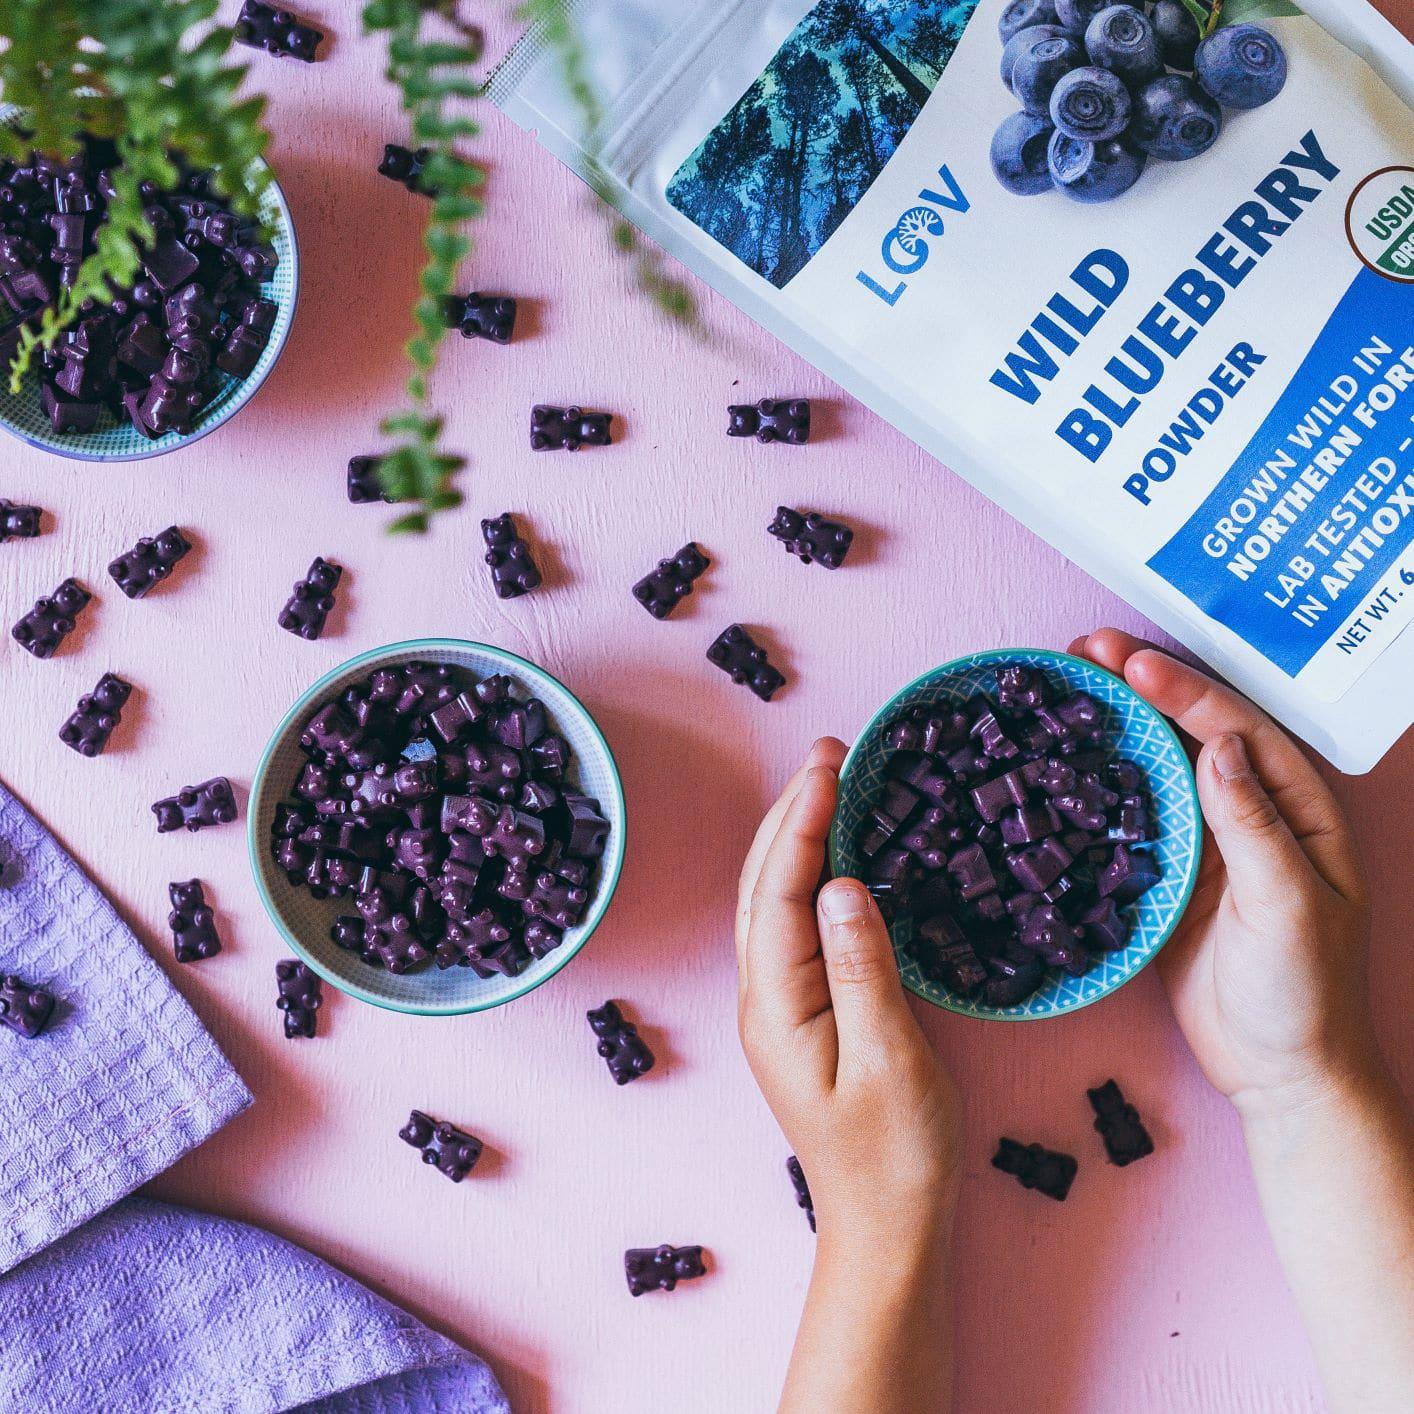 Blueberry treat gummie bears